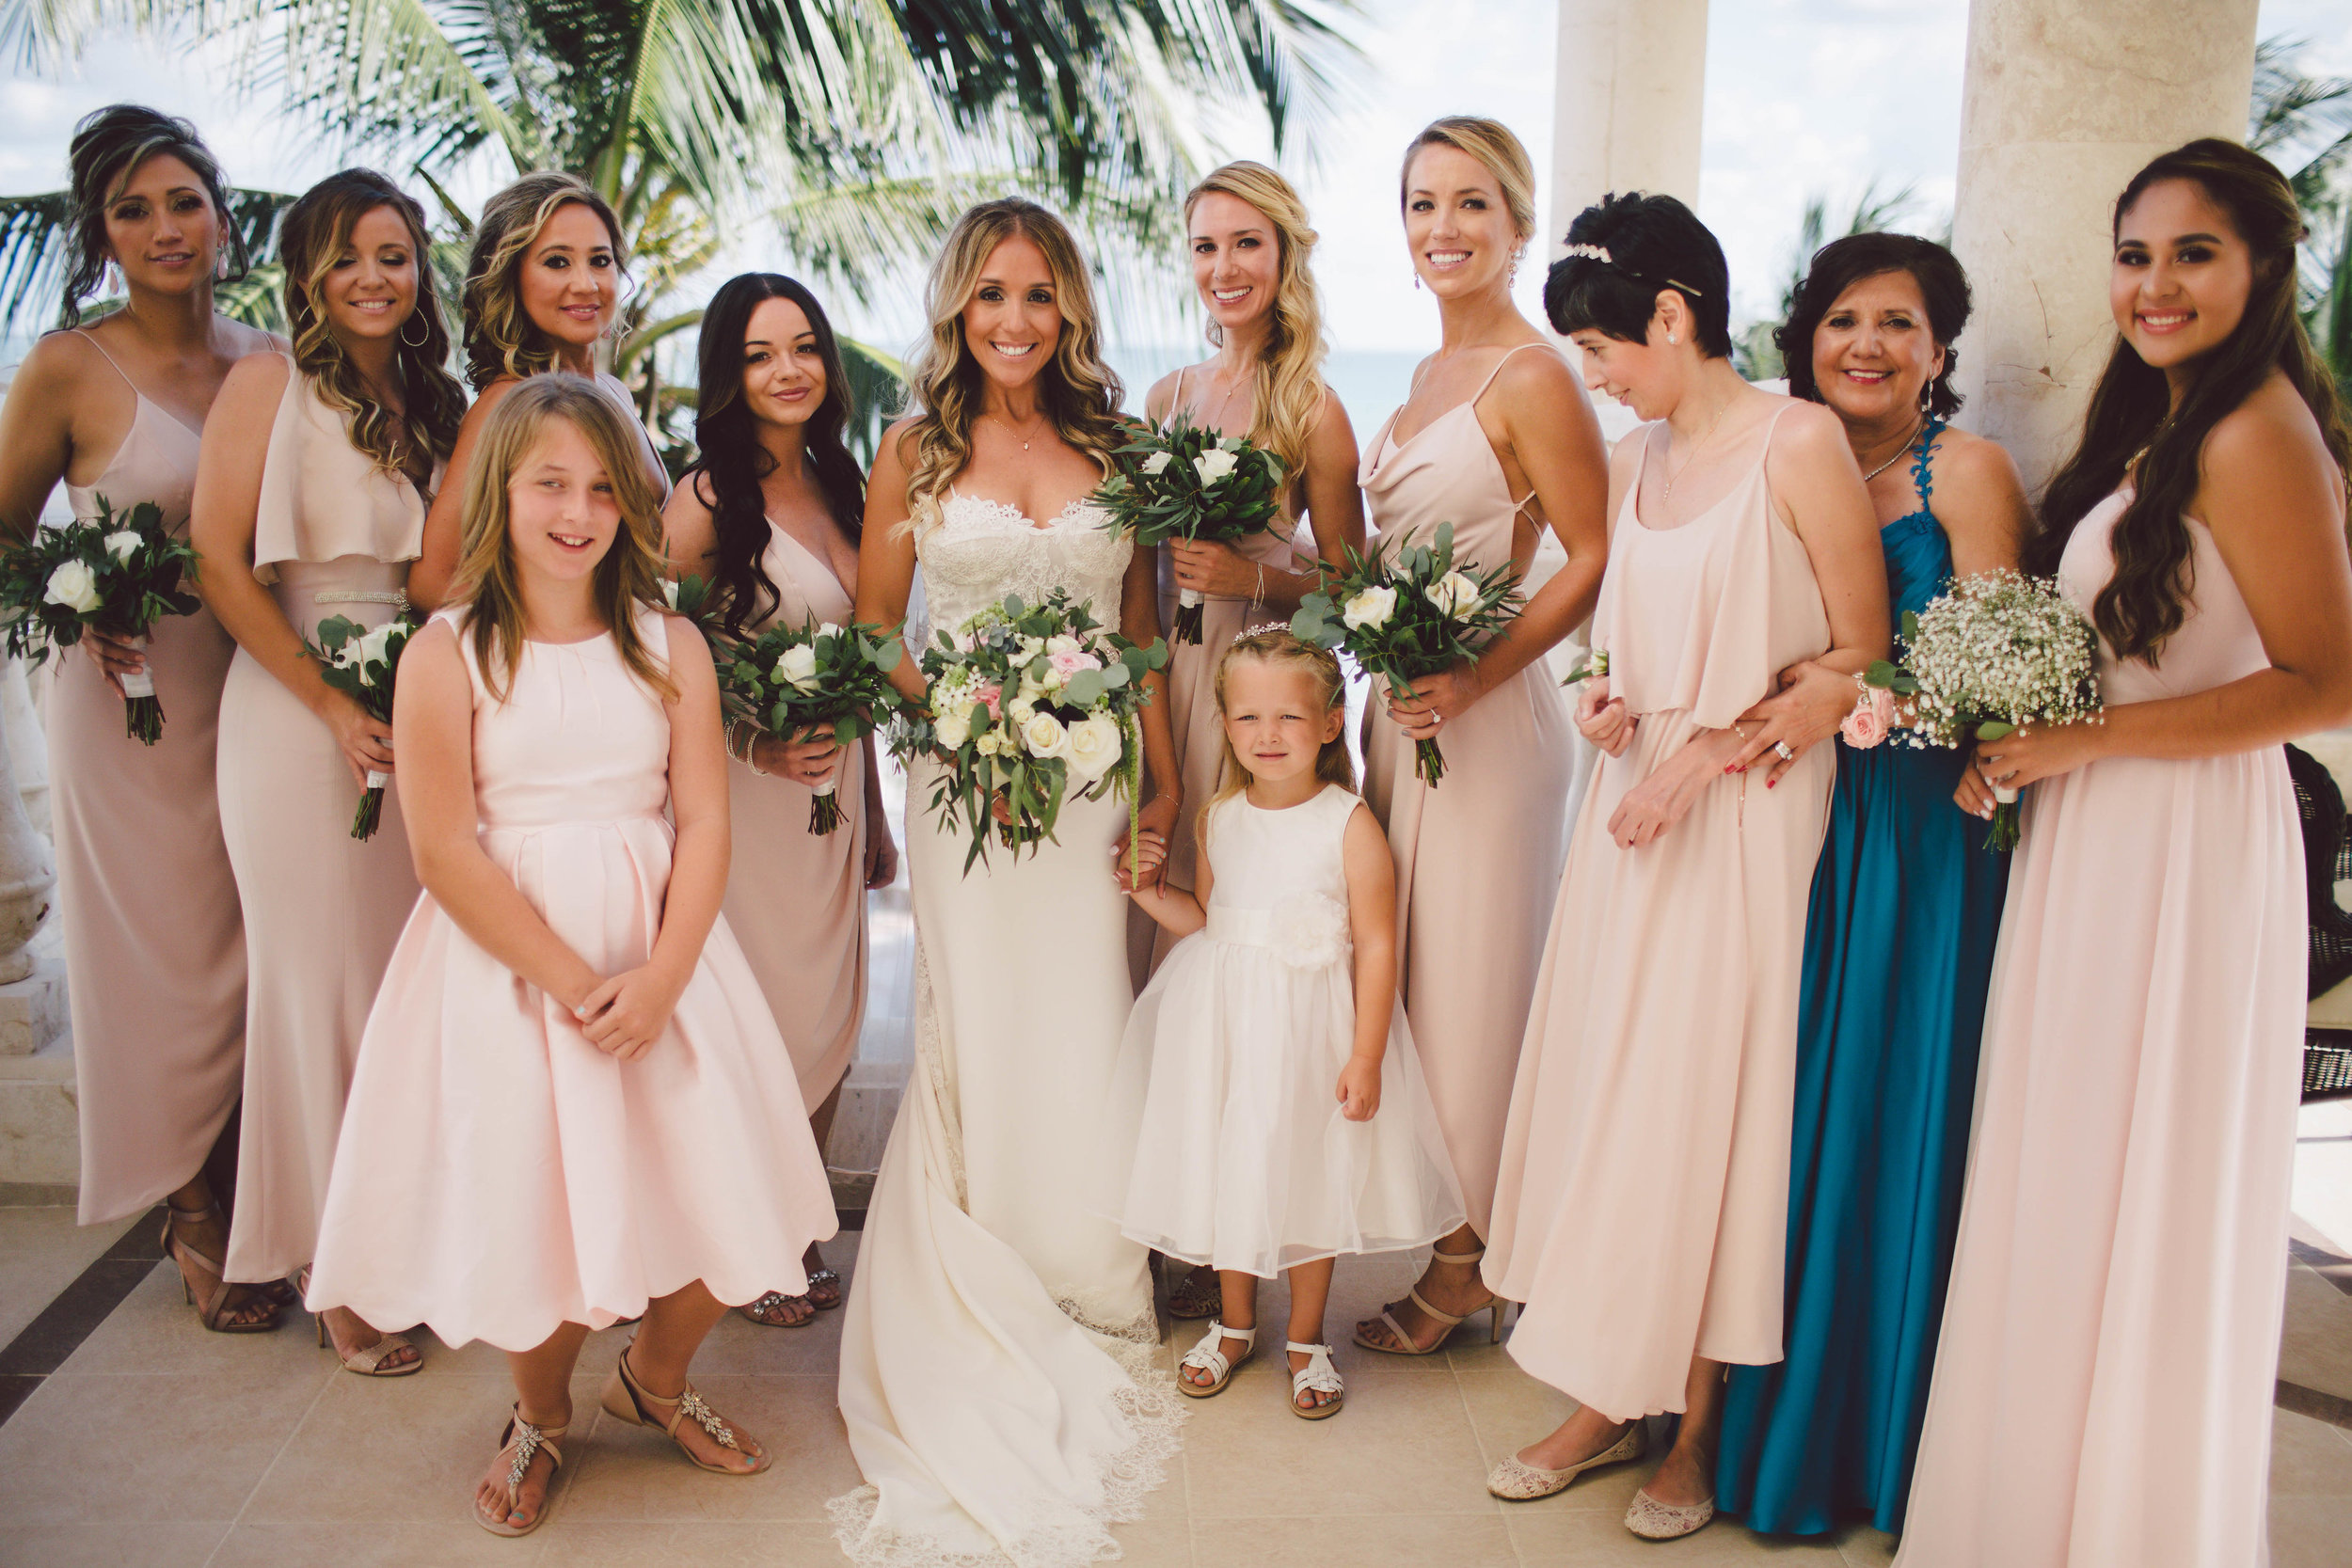 mexico_wedding_cancun_villa_la_joya_evangeline_lane_036.jpg